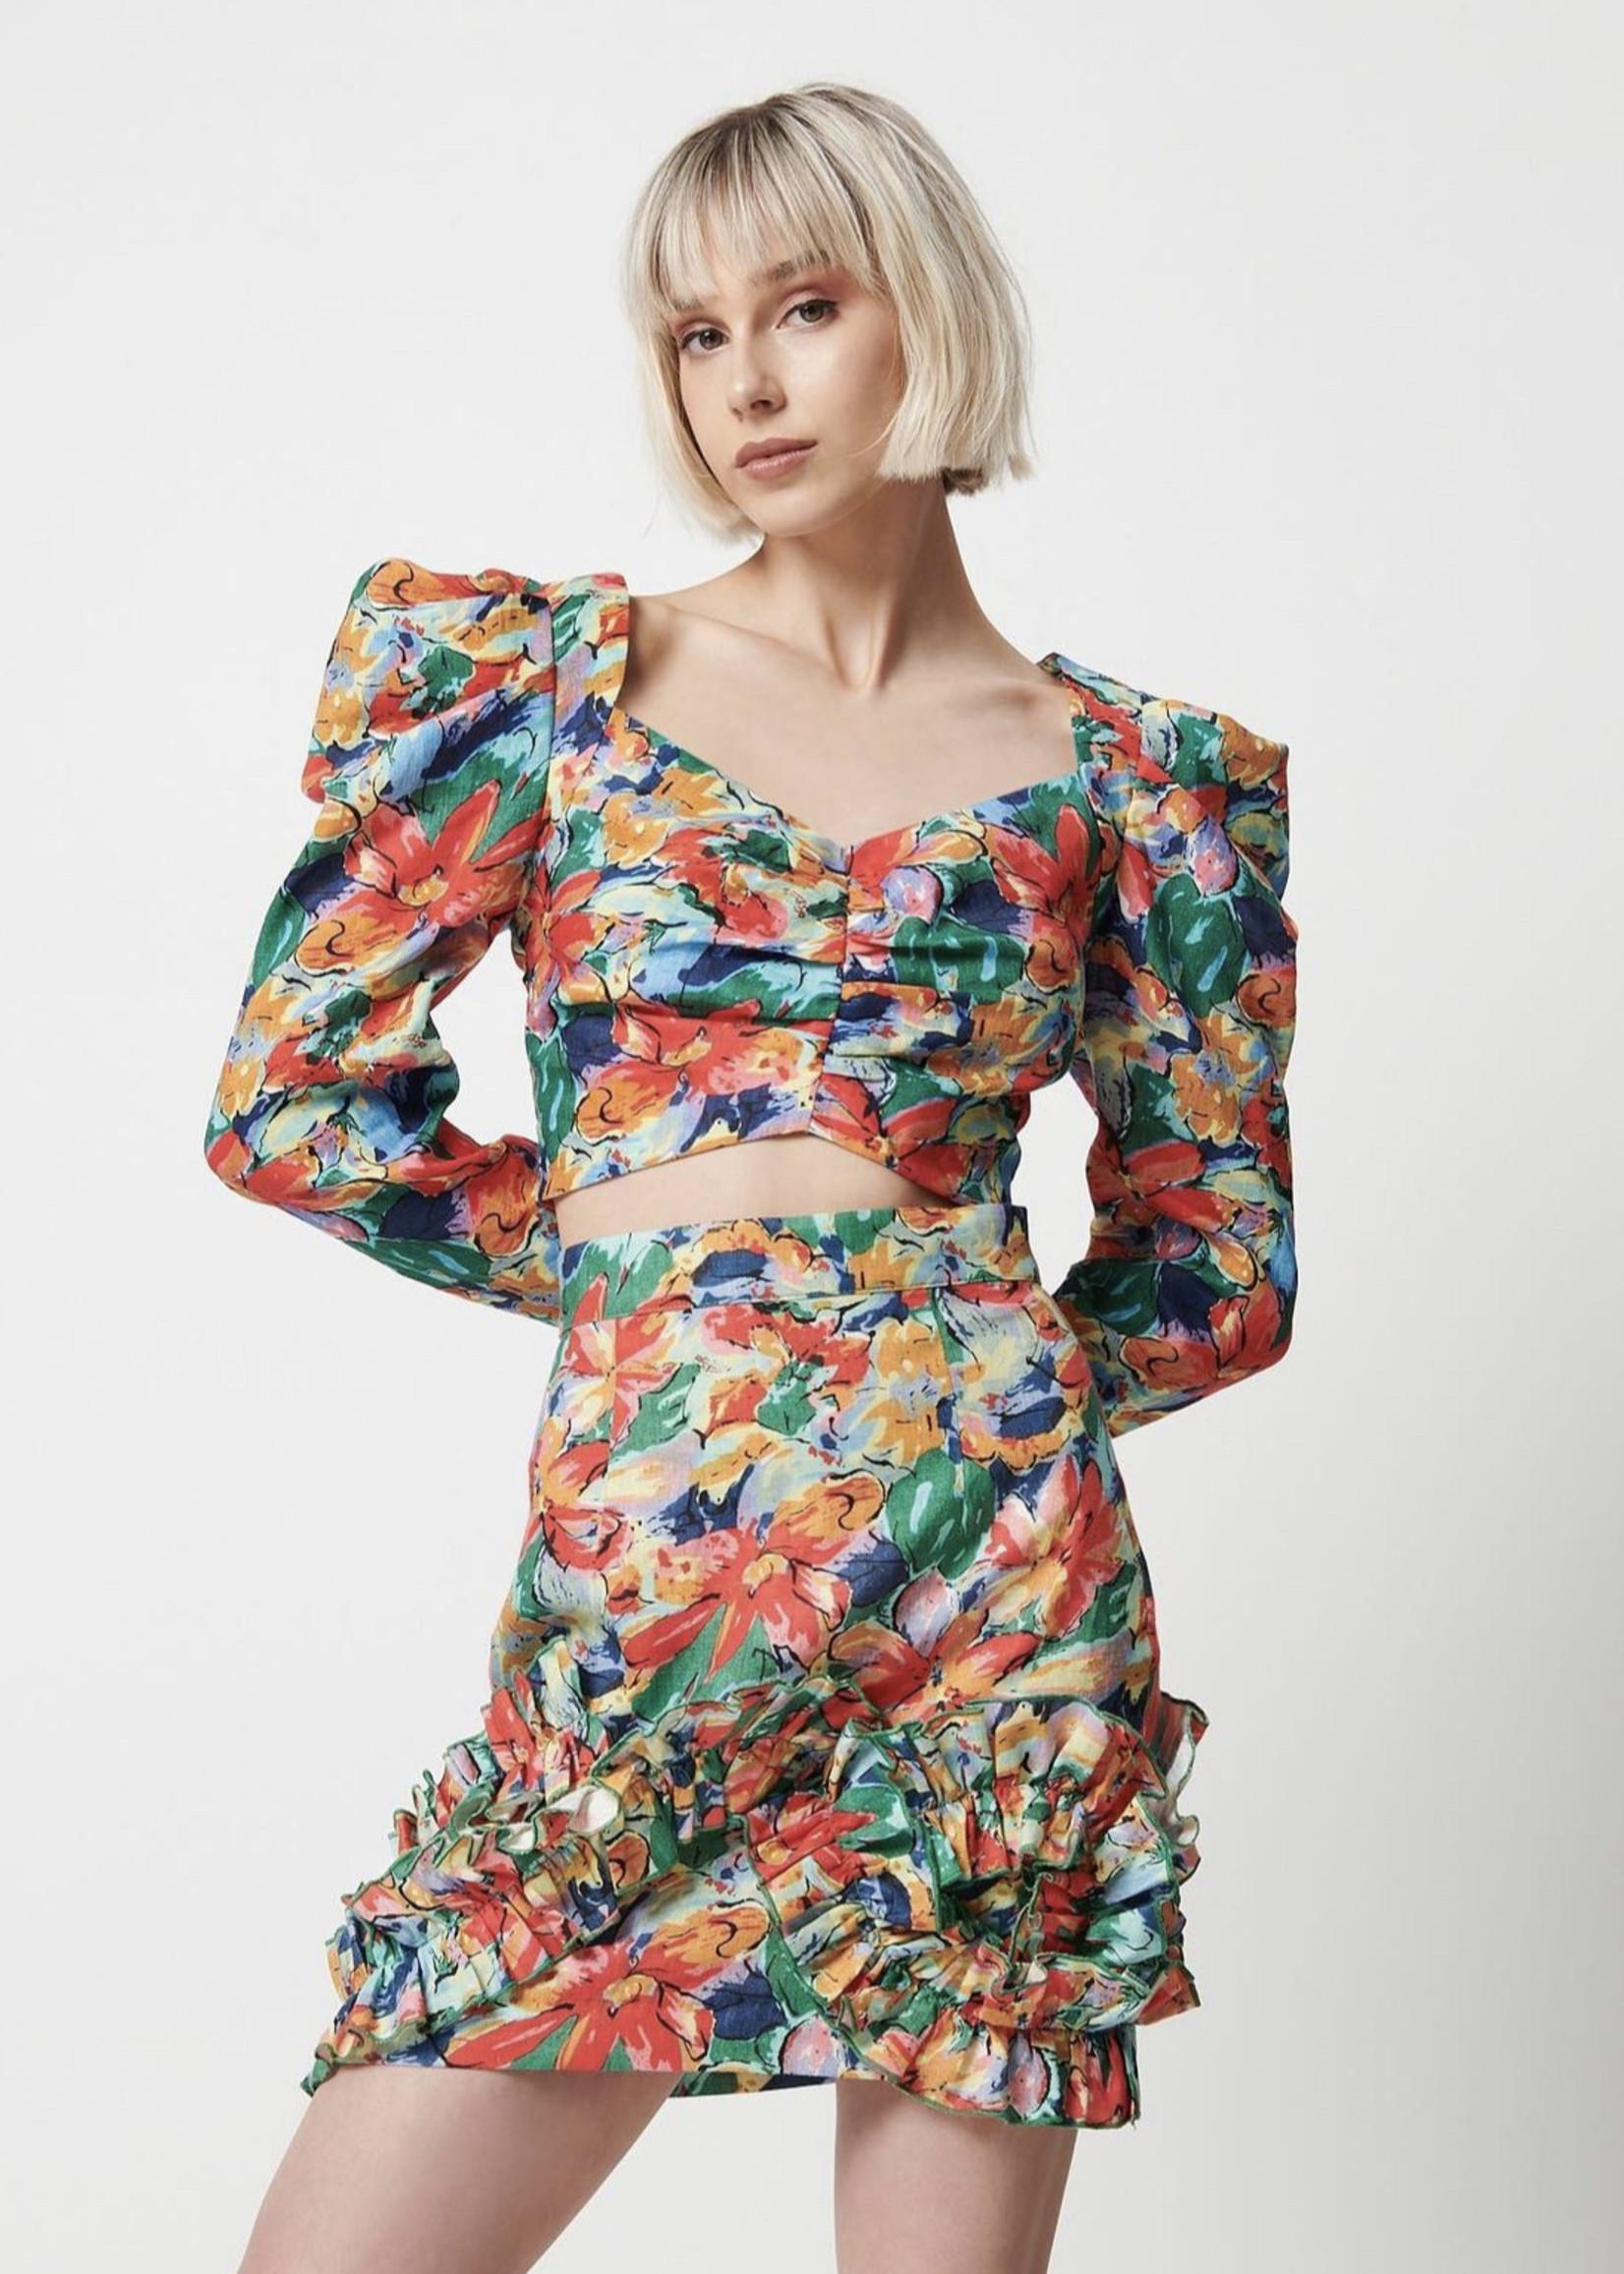 Elitaire Boutique Makenna Skirt in Multi